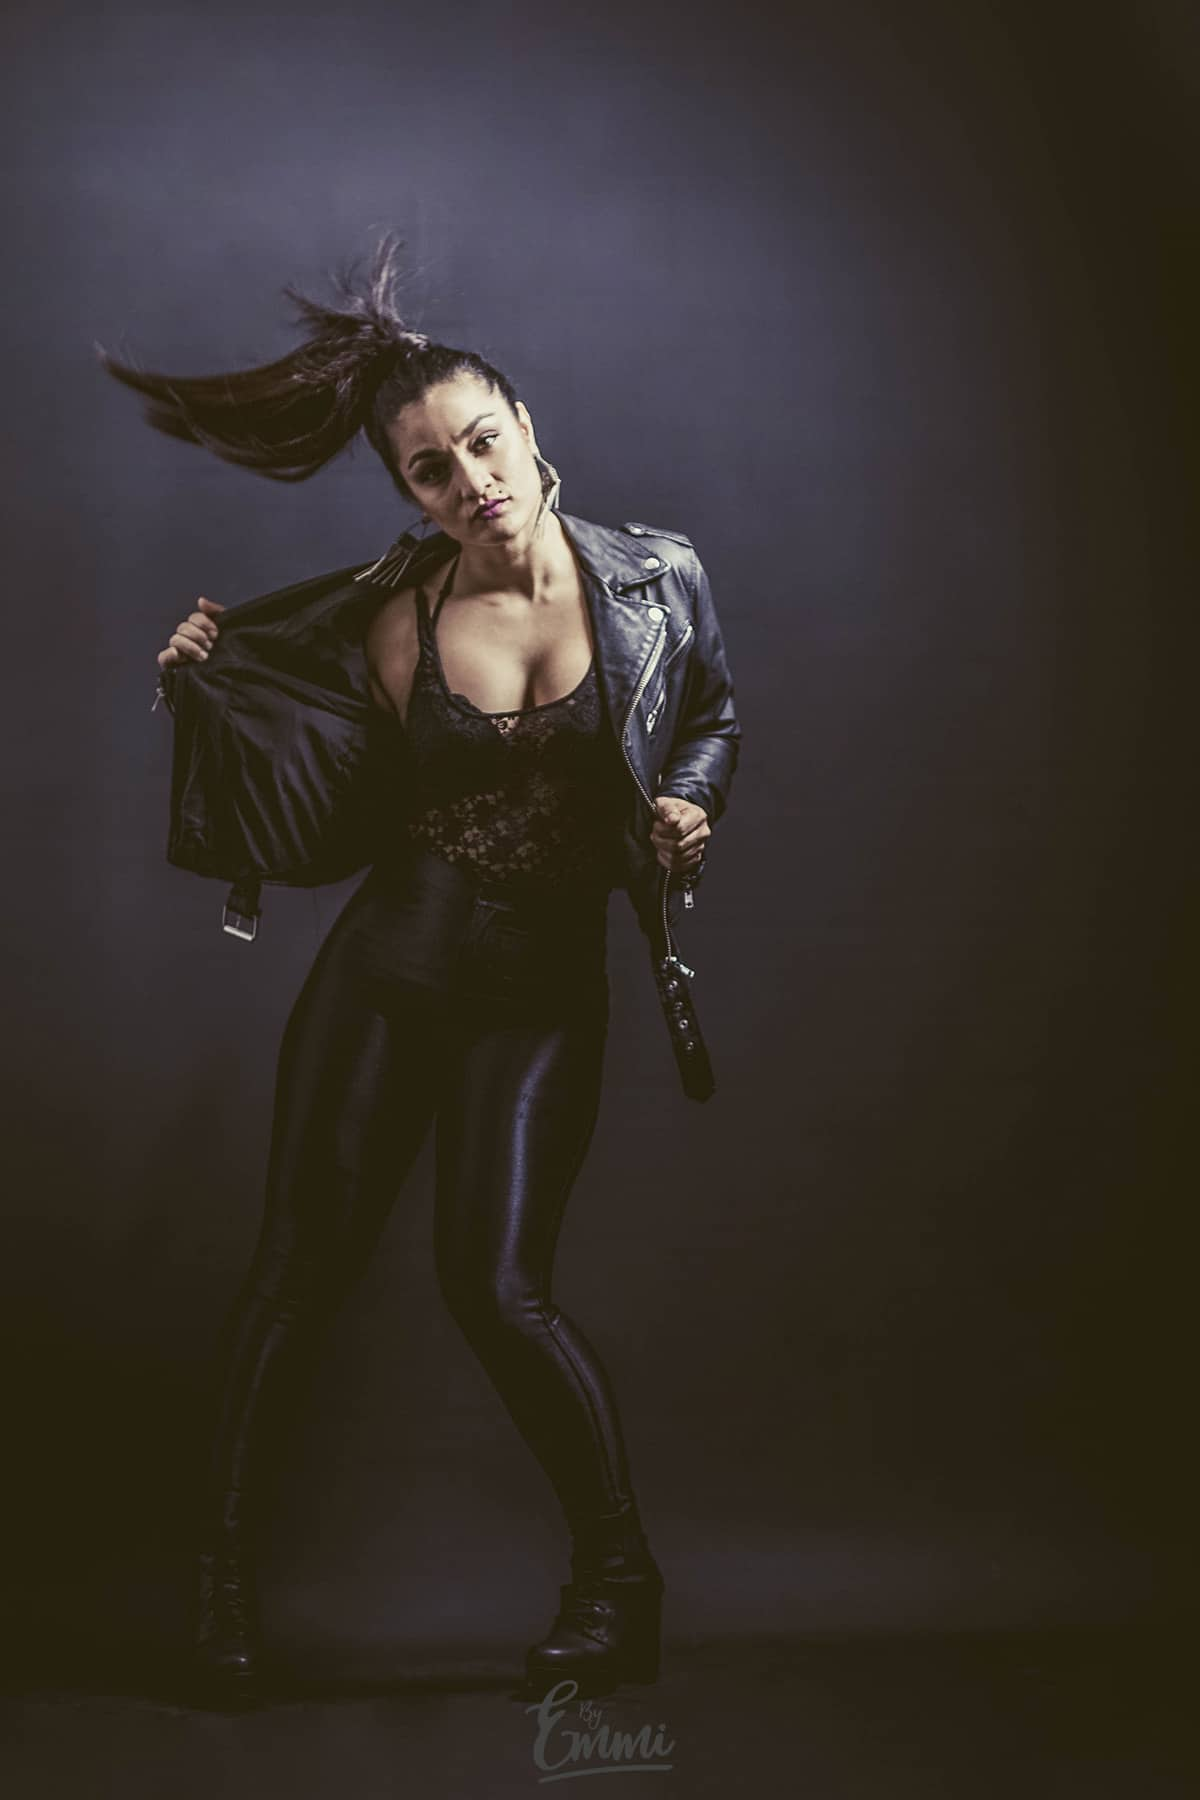 Tanssija-koreografi Sanaz Hassani